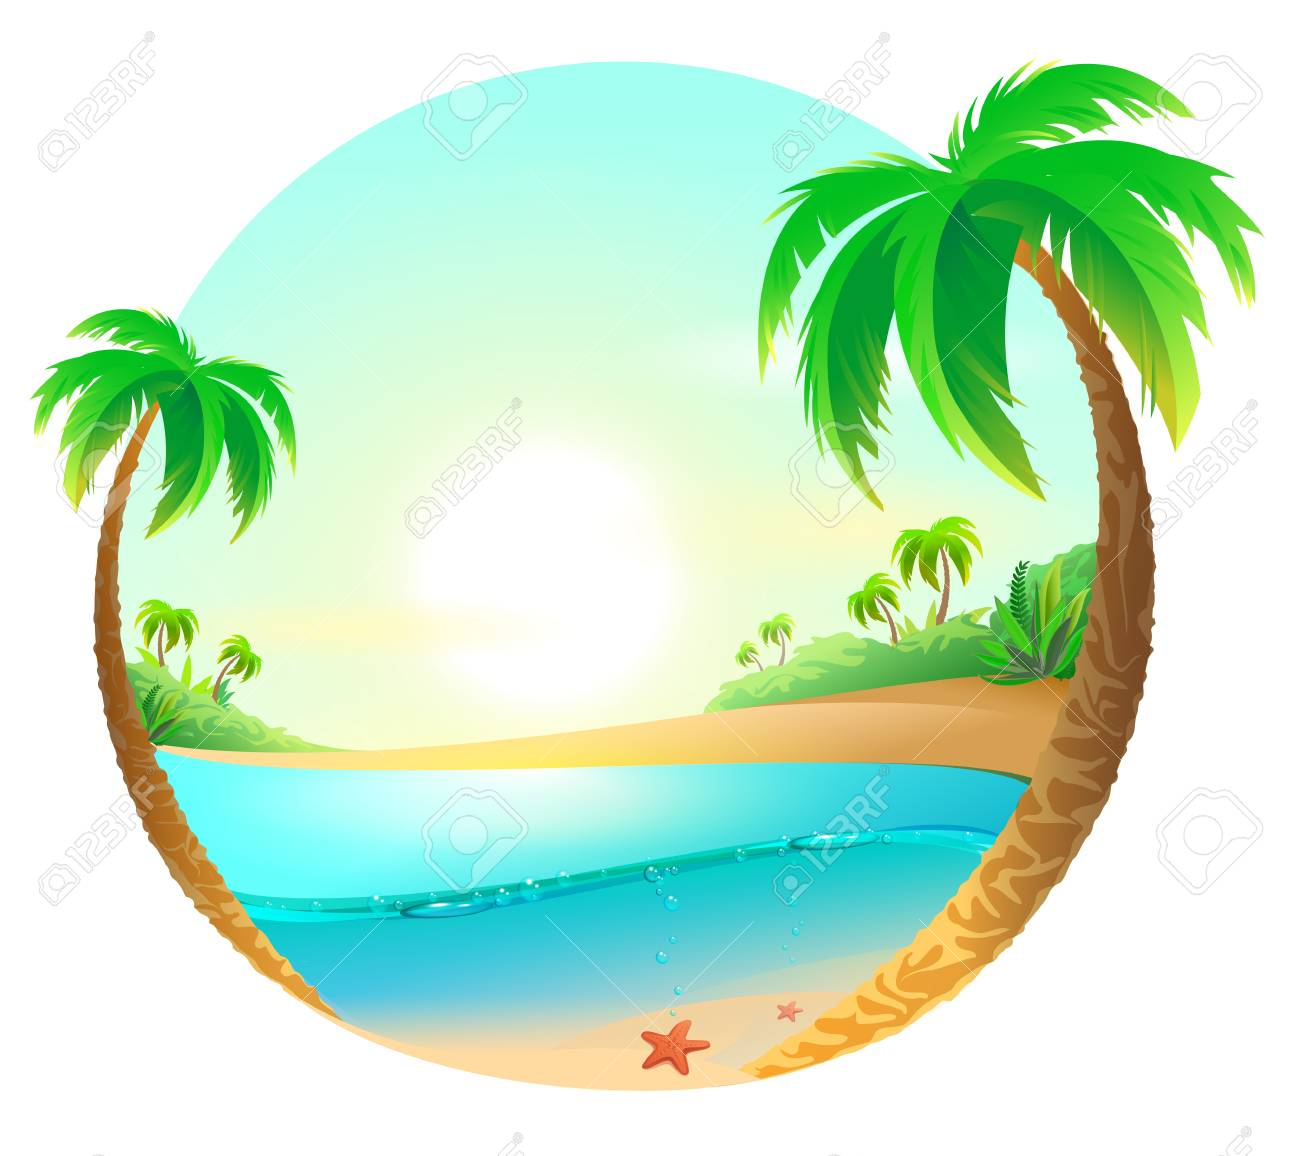 Tropical beach among palm trees. Vector cartoon illustration - 80907461